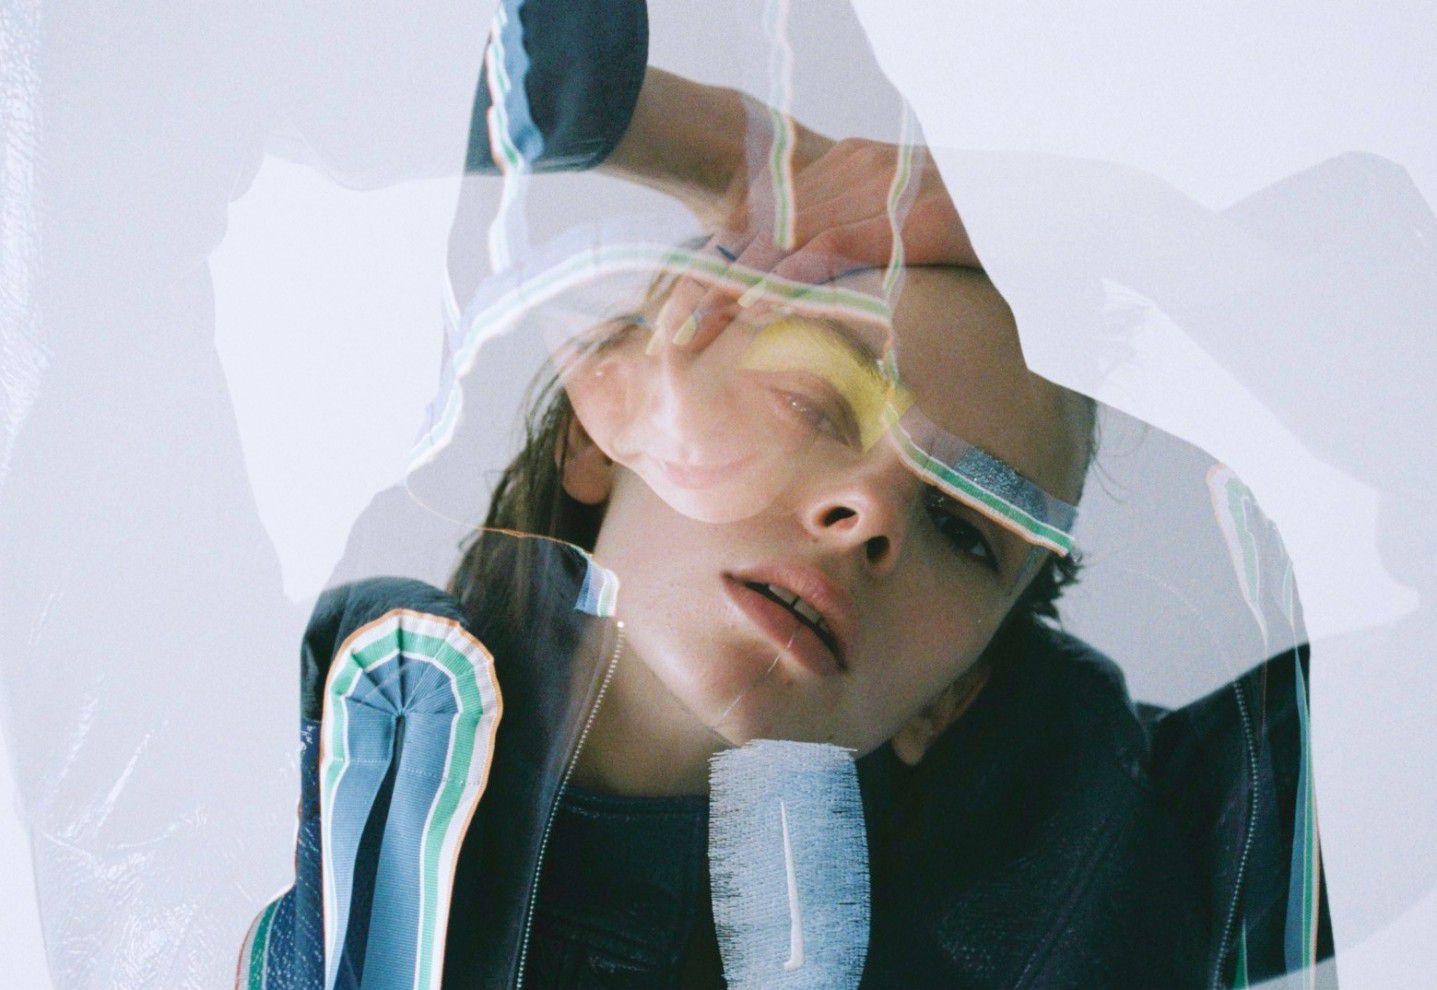 NeoL Magazine JP | Fashion Direction / Photo Editor : Lina Hitomi | Interview&Text: Ryoko Kuwahara | Executive Producer: Lisa Tanimura | Photographer:Toshiaki Kitaoka | Stylist: Koji Oyamada | Hair&Make-up: Rie Shiraishi | Models: Alek, Morga | Clothes sponsored by Farfetch #NeoLMagazine #waltervanbeirendonck #cottweiler #fashion #fashionphotography #farfetch #ファーフェッチ